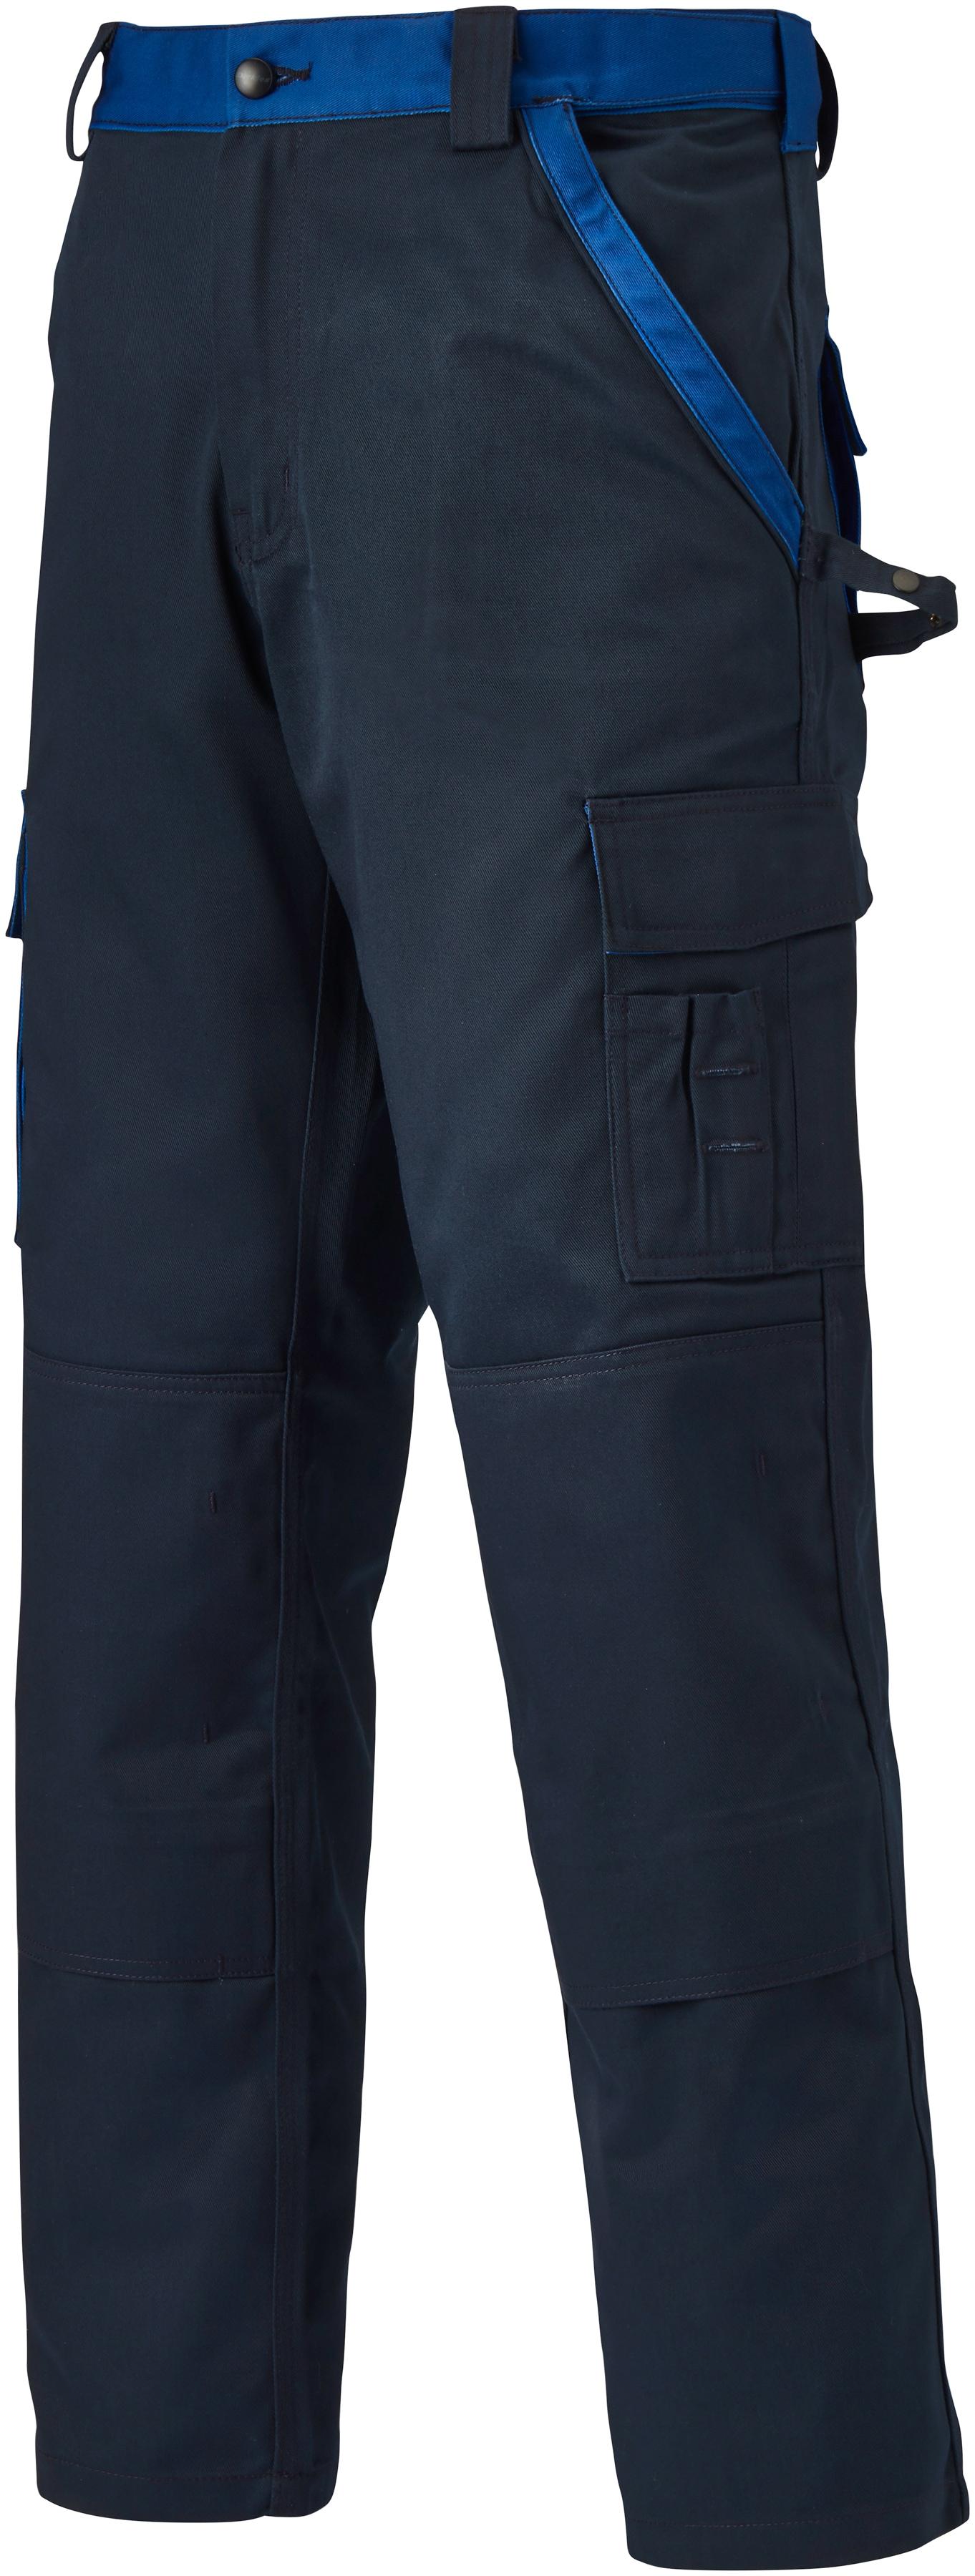 Dickies Arbeitshose Industry Bundhose 2.0, weite Passform blau Herren Arbeitshosen Arbeits- Berufsbekleidung